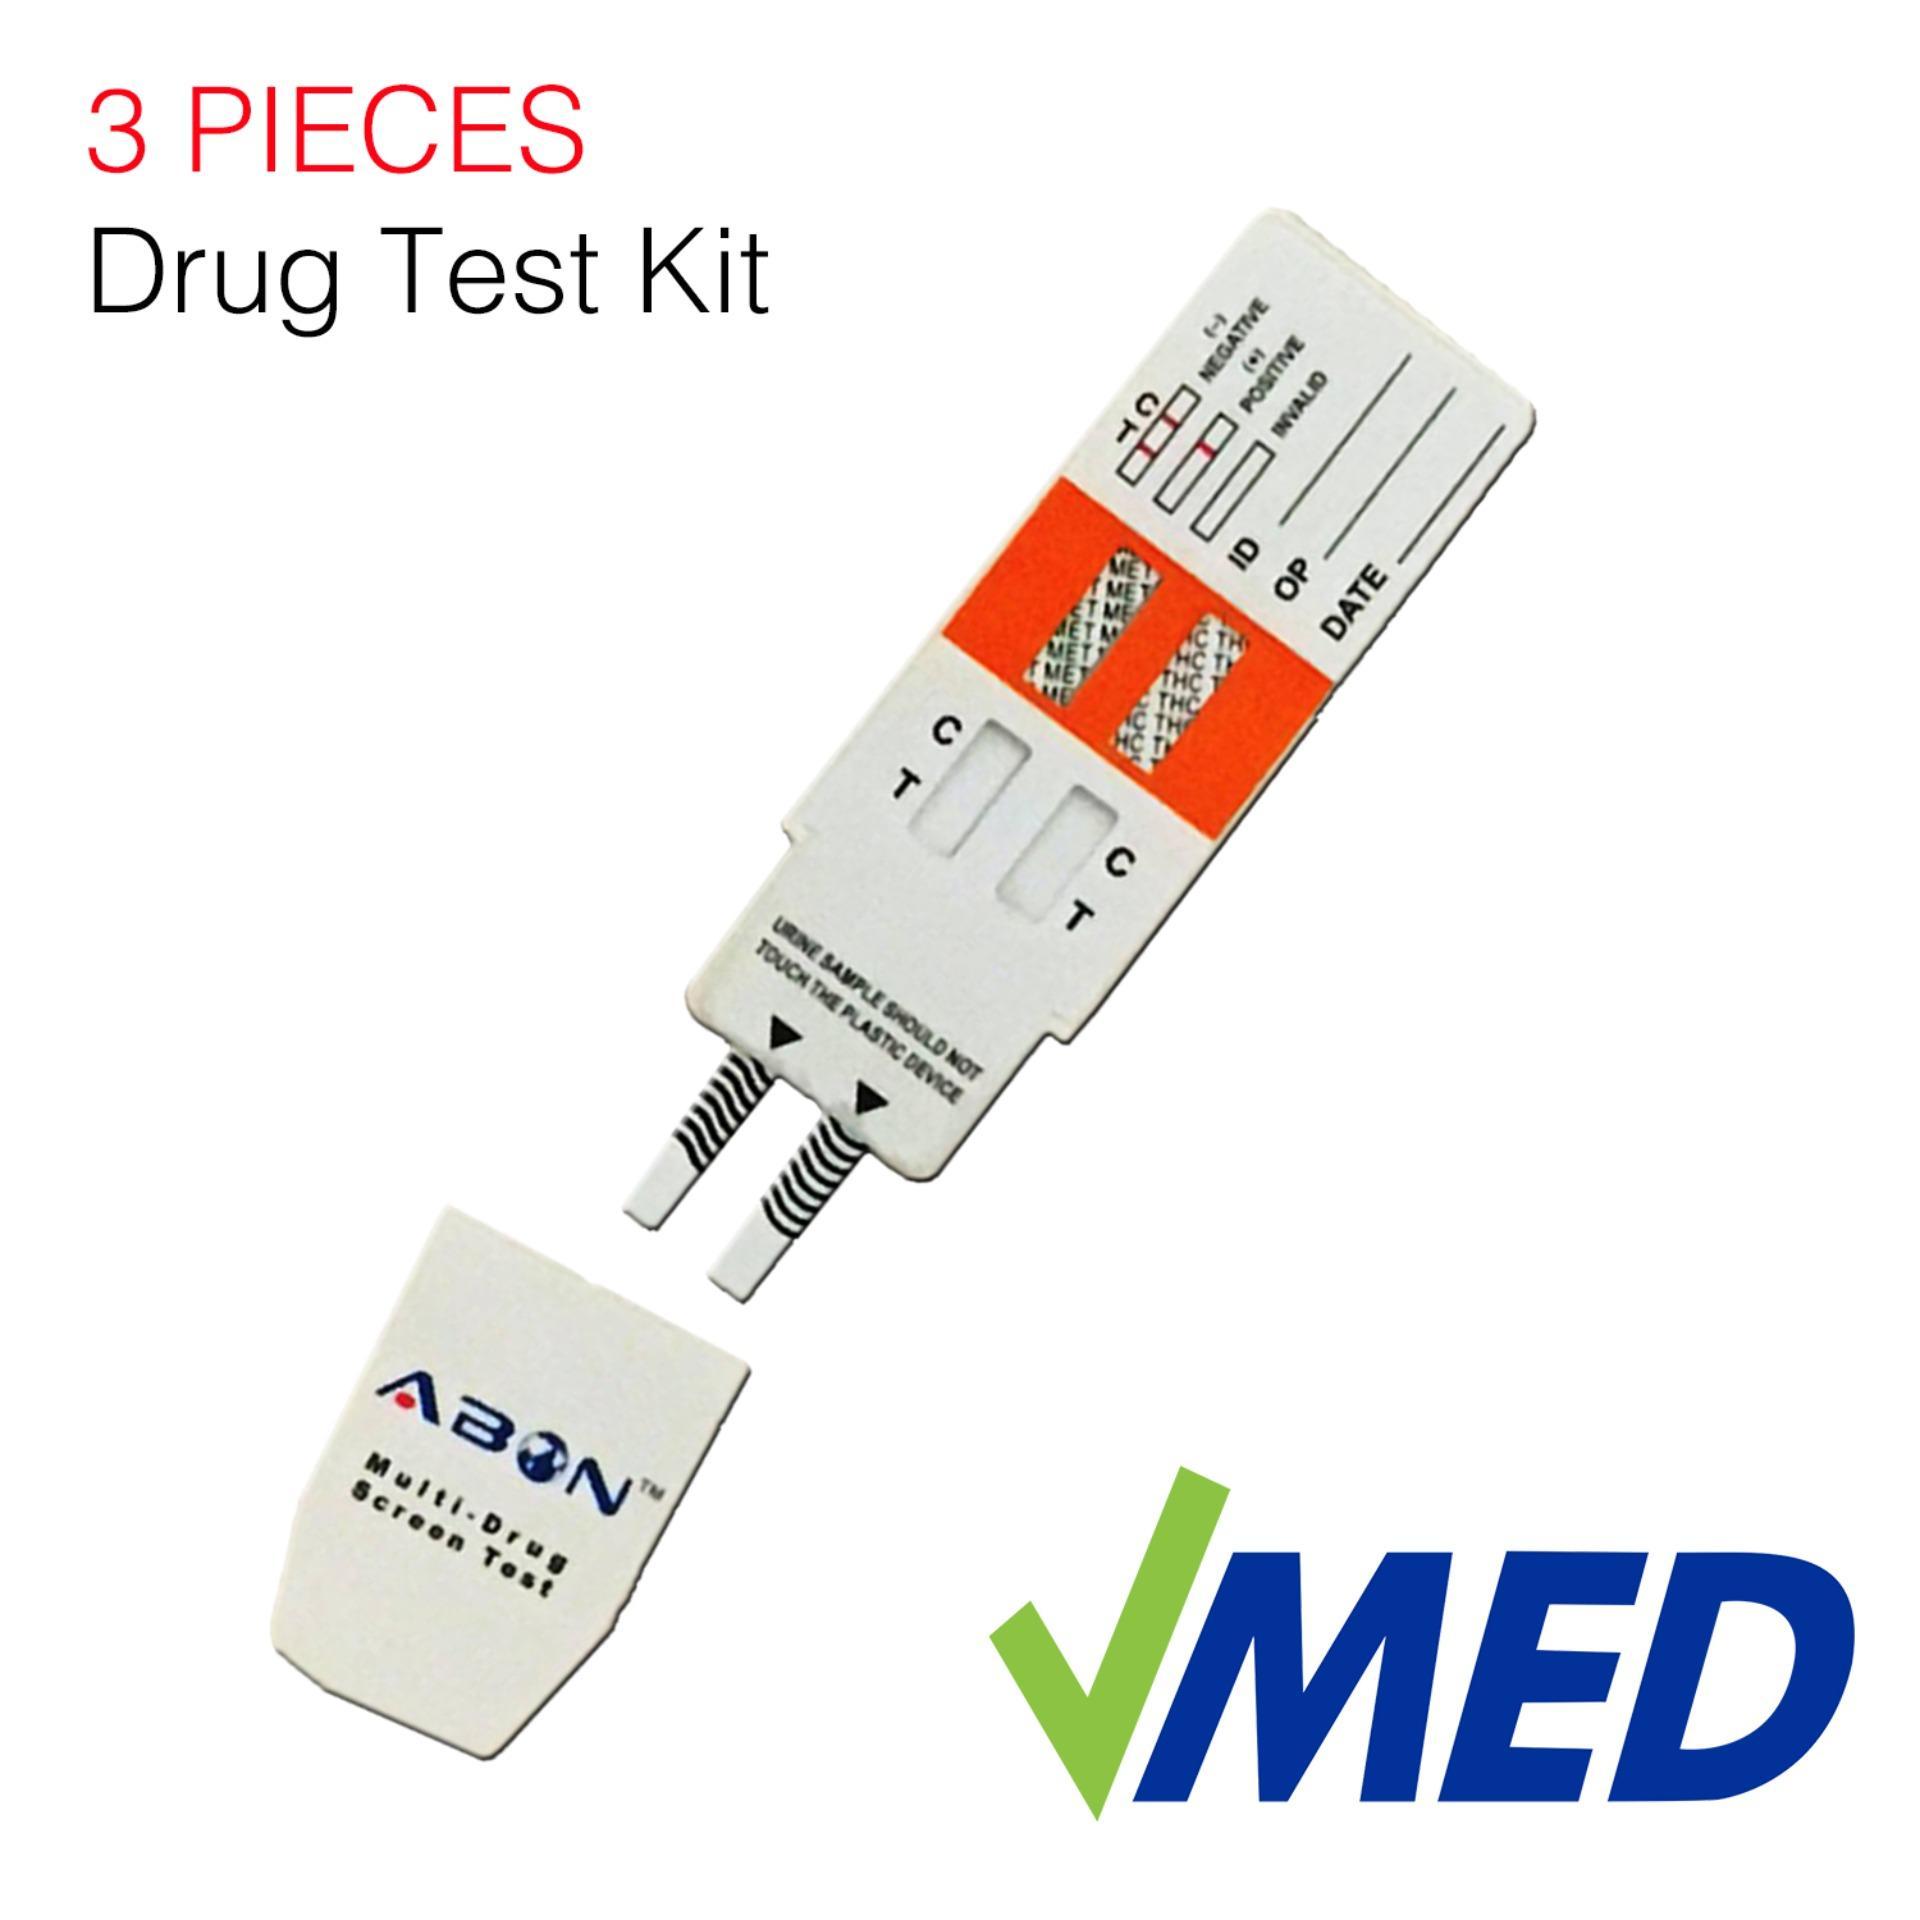 Drug Test Kit, THC and Meth 3pcs